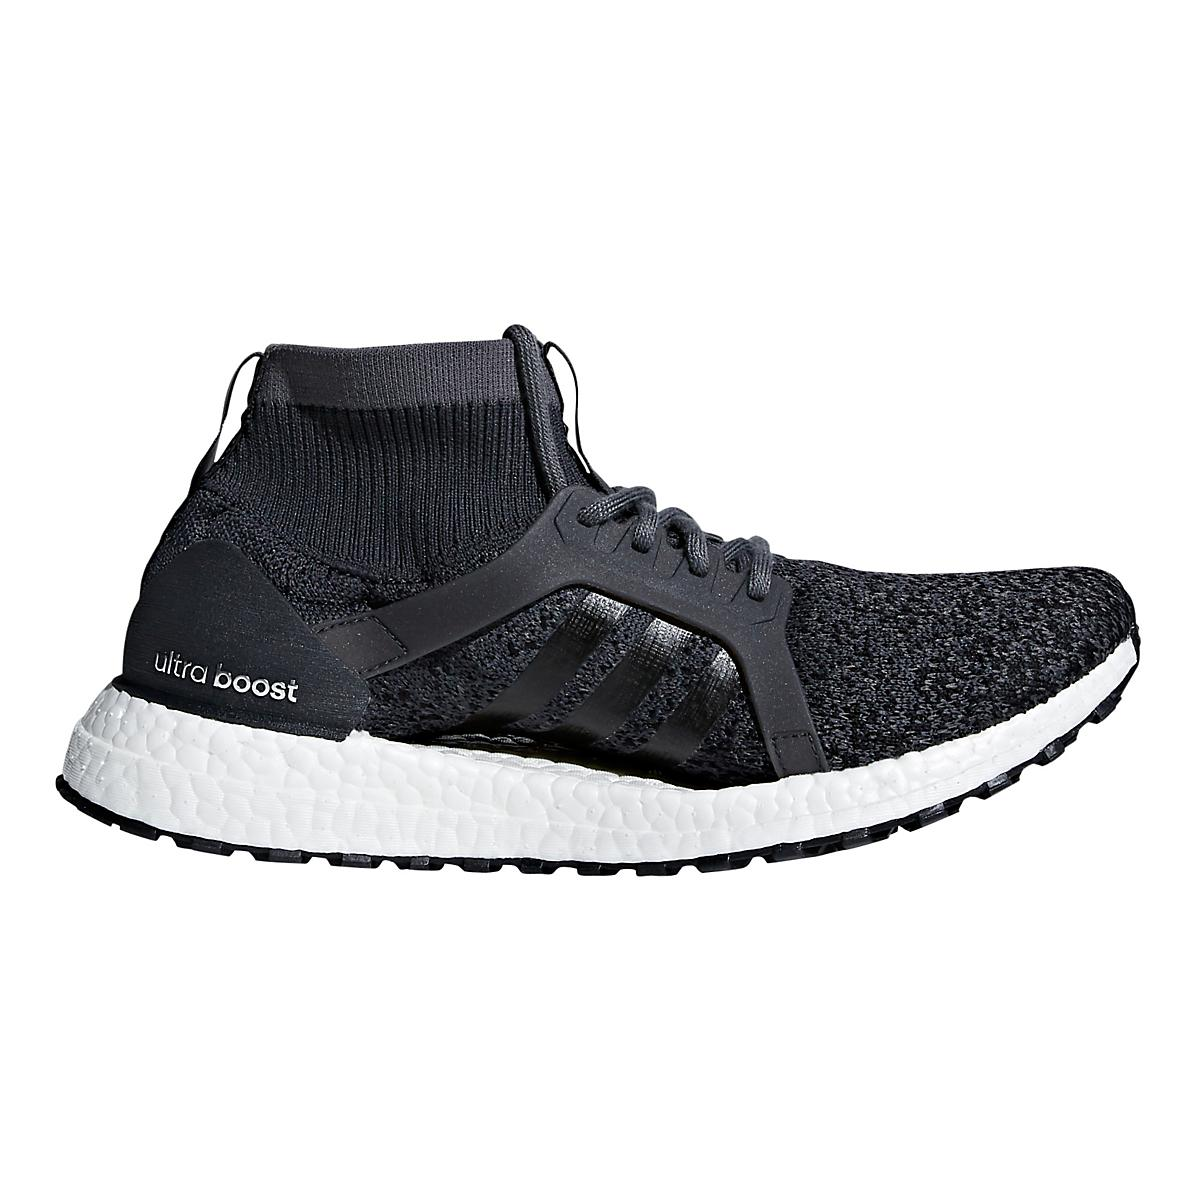 b0a031ea2 Womens adidas Ultra Boost X ATR Running Shoe at Road Runner Sports